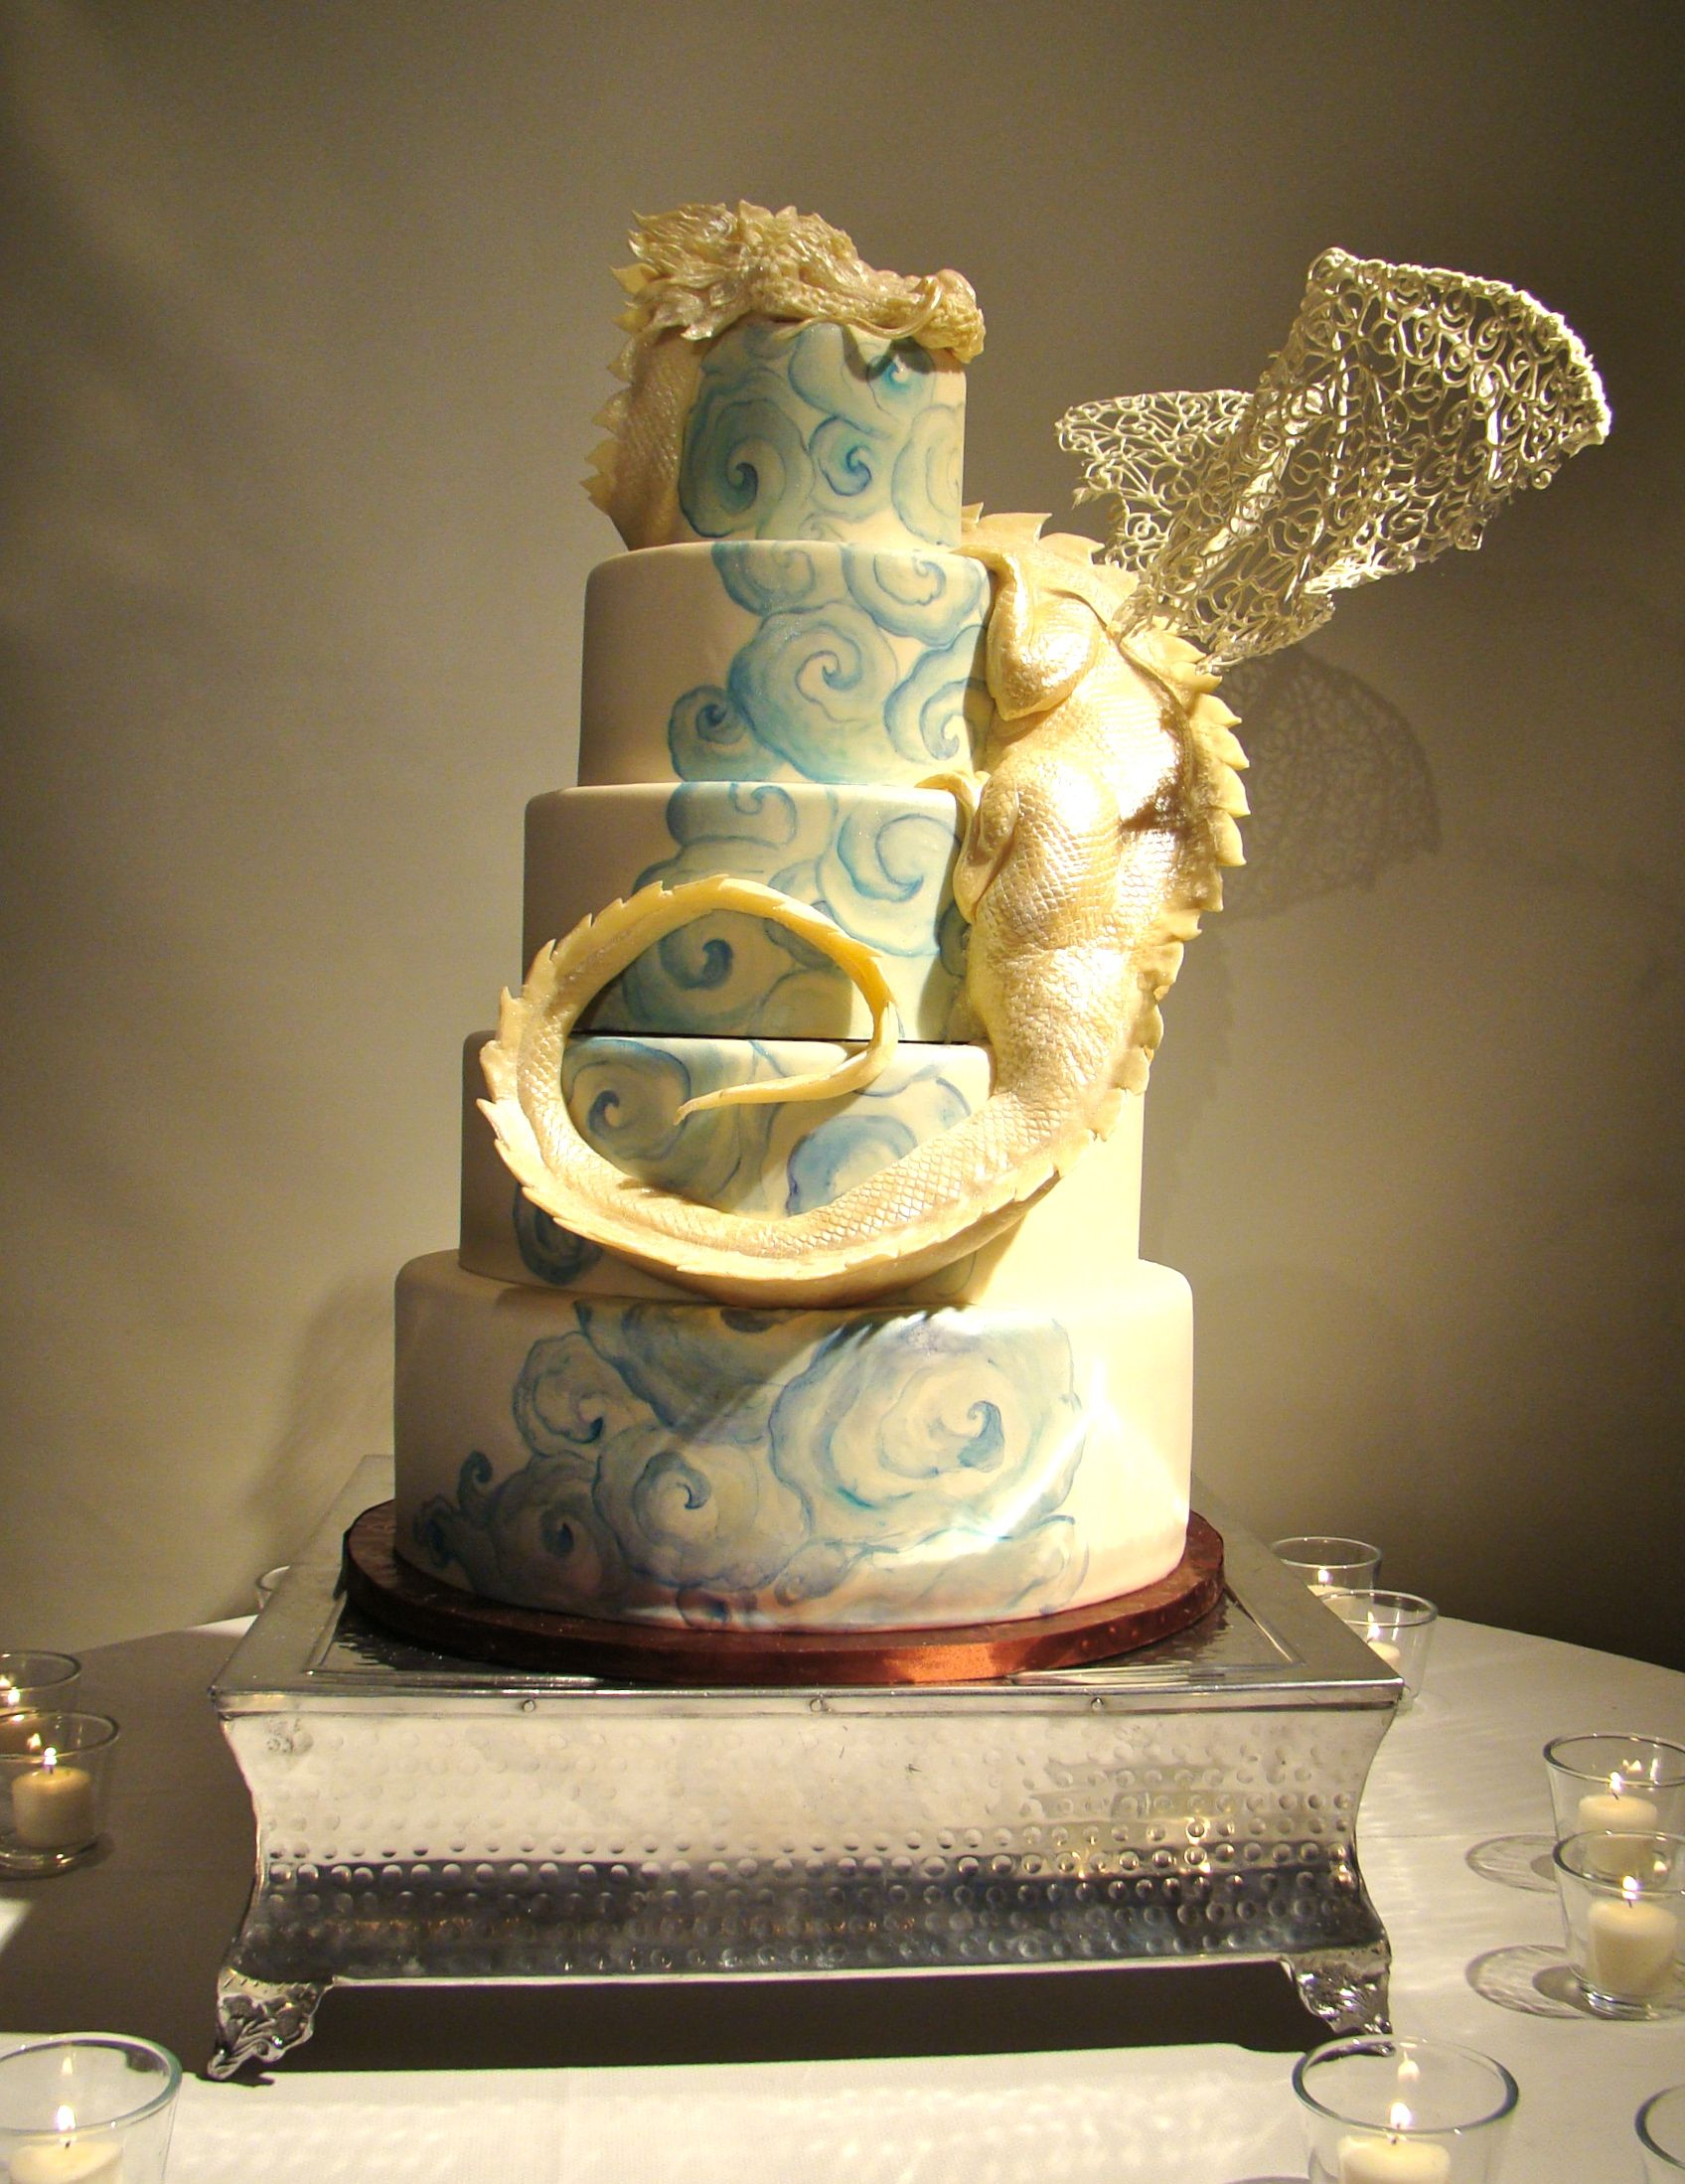 Dragon Wedding Cake by The Butter End Cakery | Cakes & Desserts | Design & Decor | Wedding Design Ideas | | WEDDING NOUVEAU